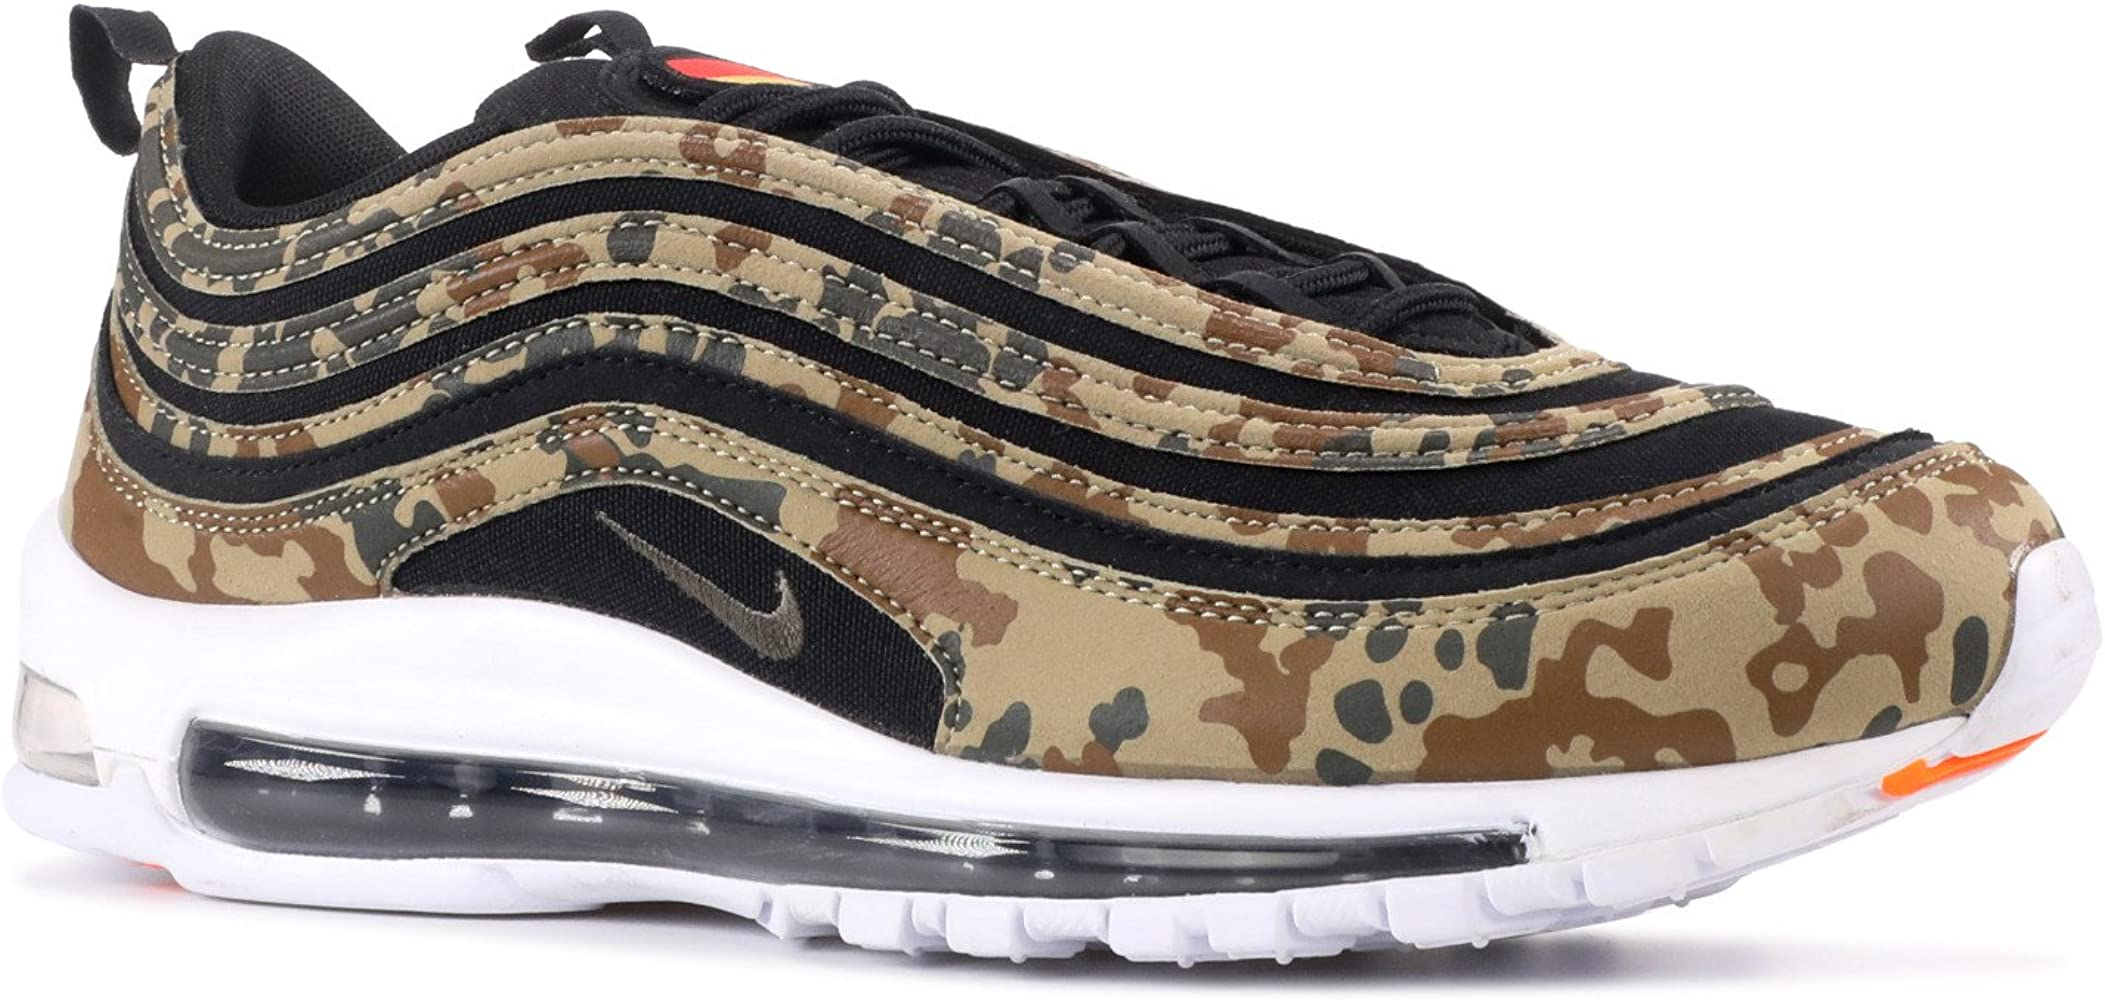 Nike Air Max 97 Premium QS Schuhe Sneaker Neu Unisex (EU 36